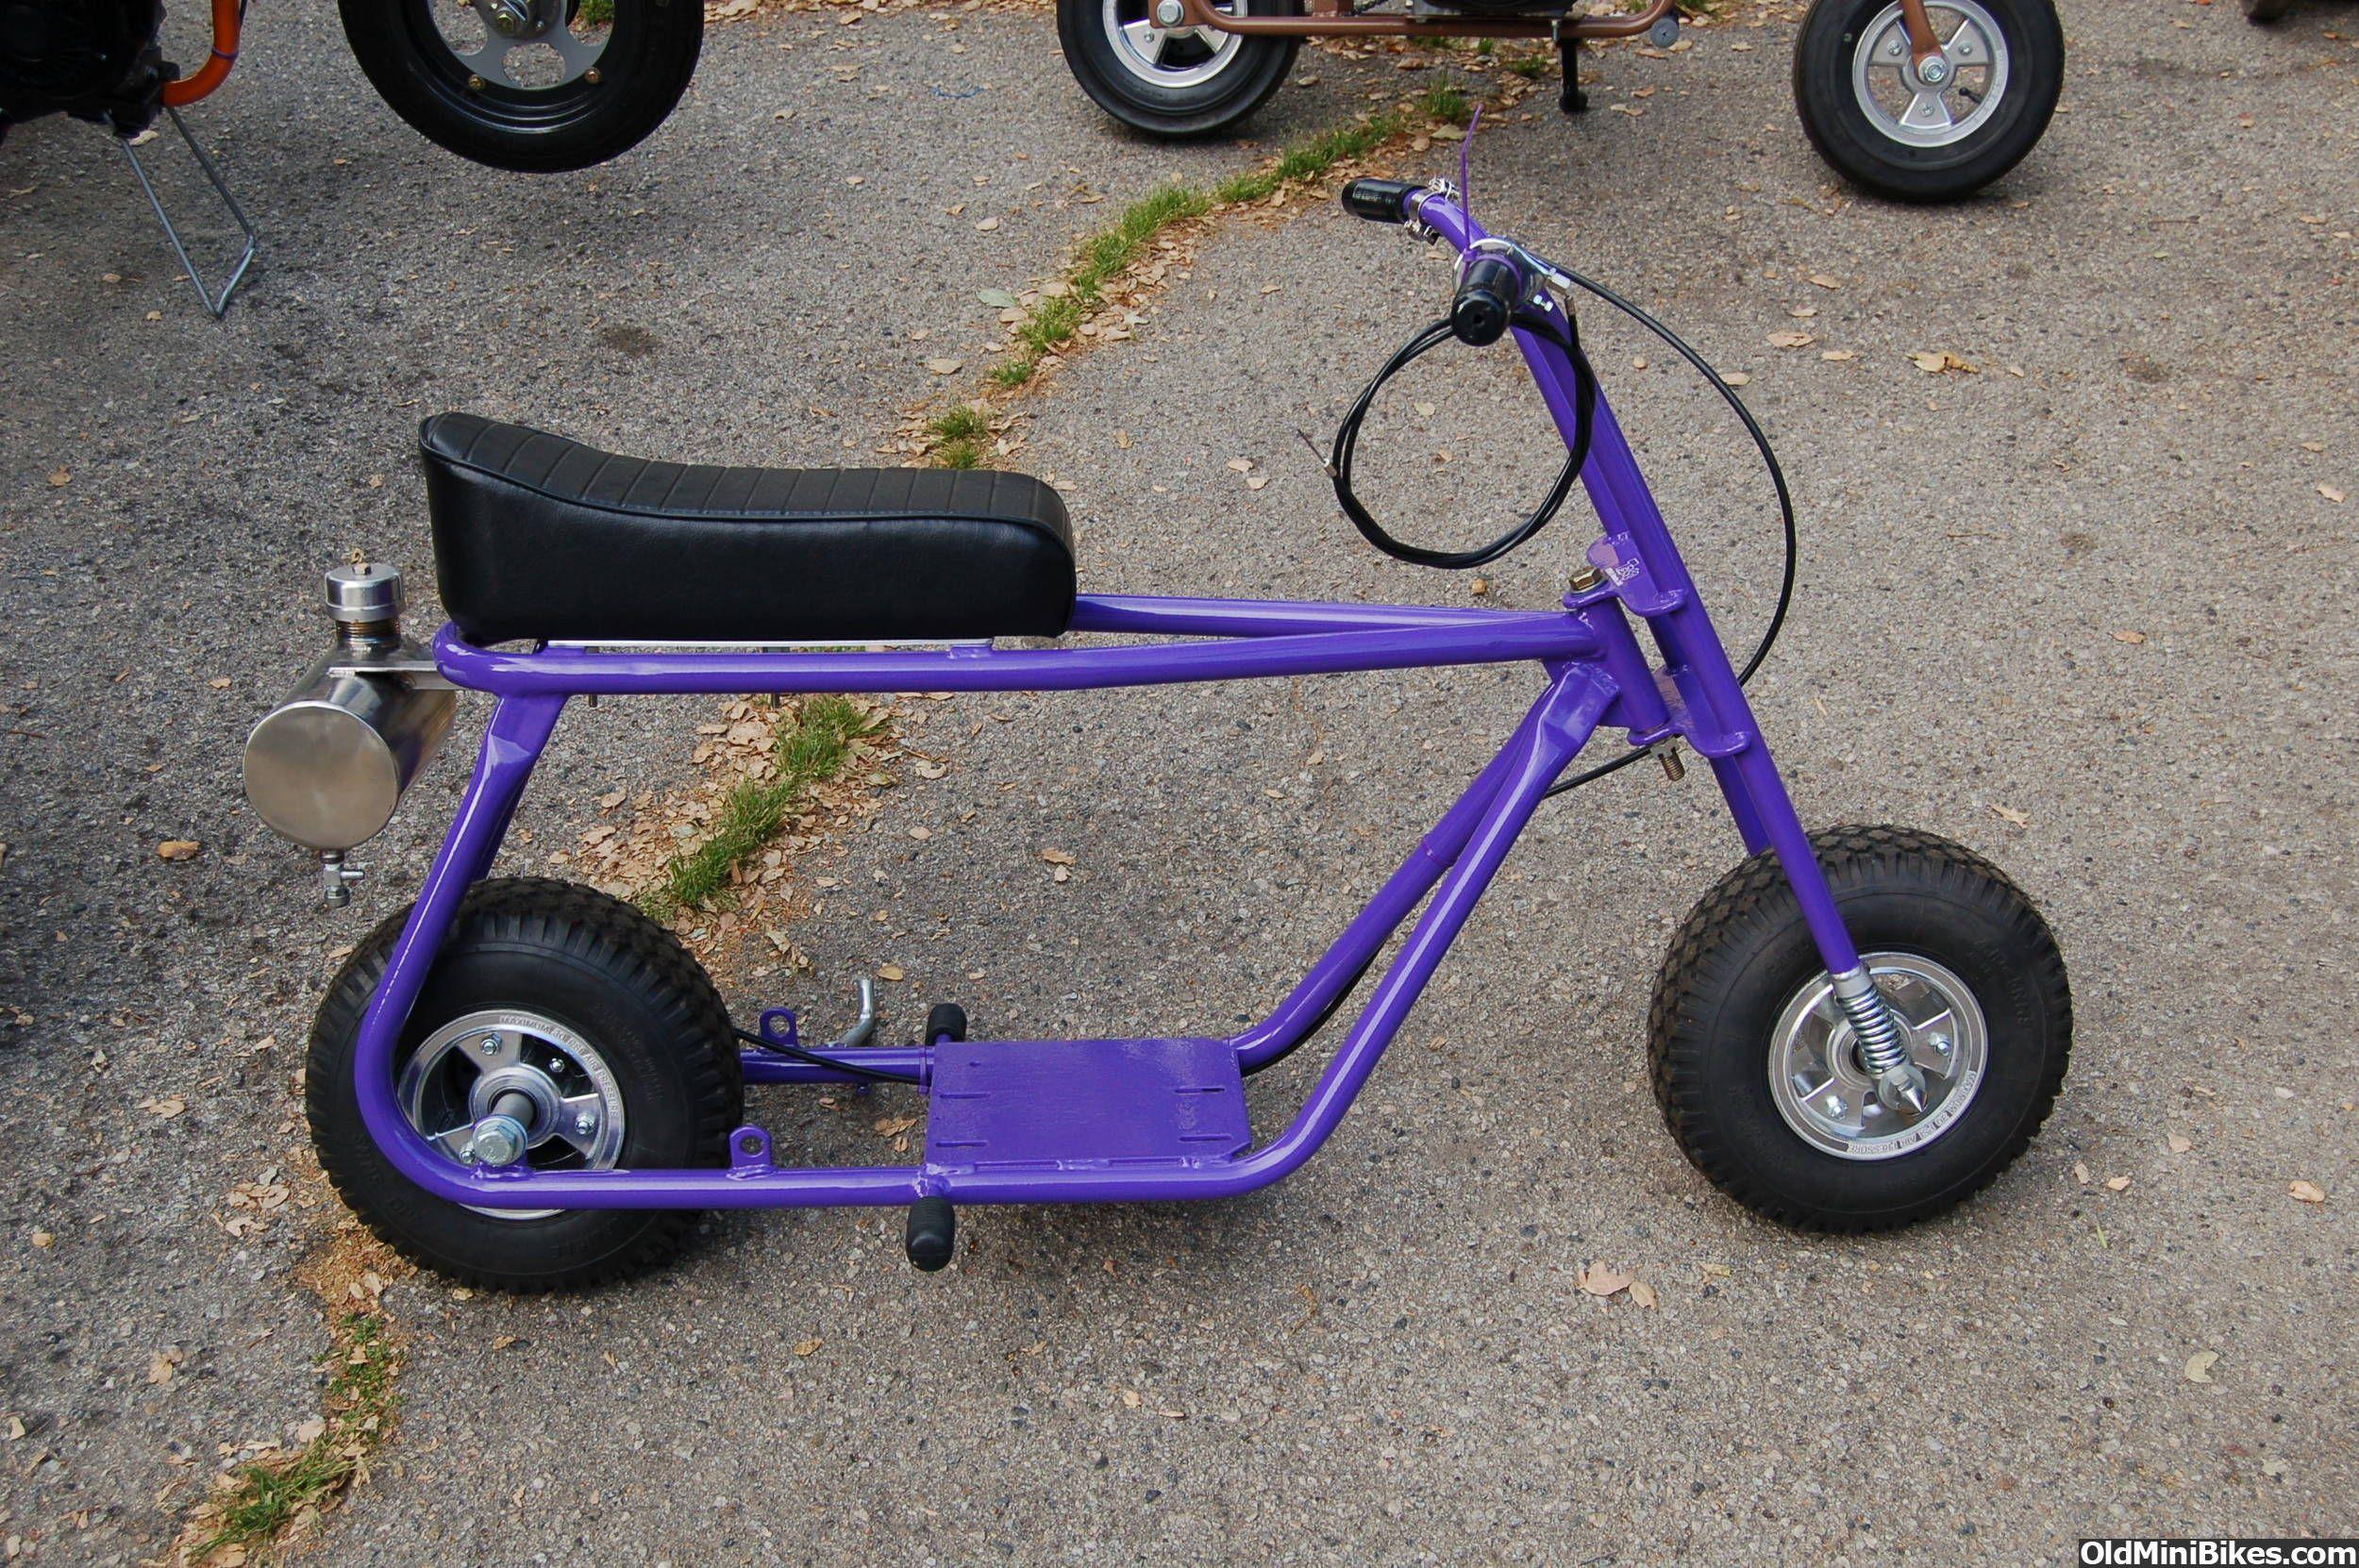 Best Taco Mini Bikes - http://bike.kintakes.com/best-taco-mini-bikes/